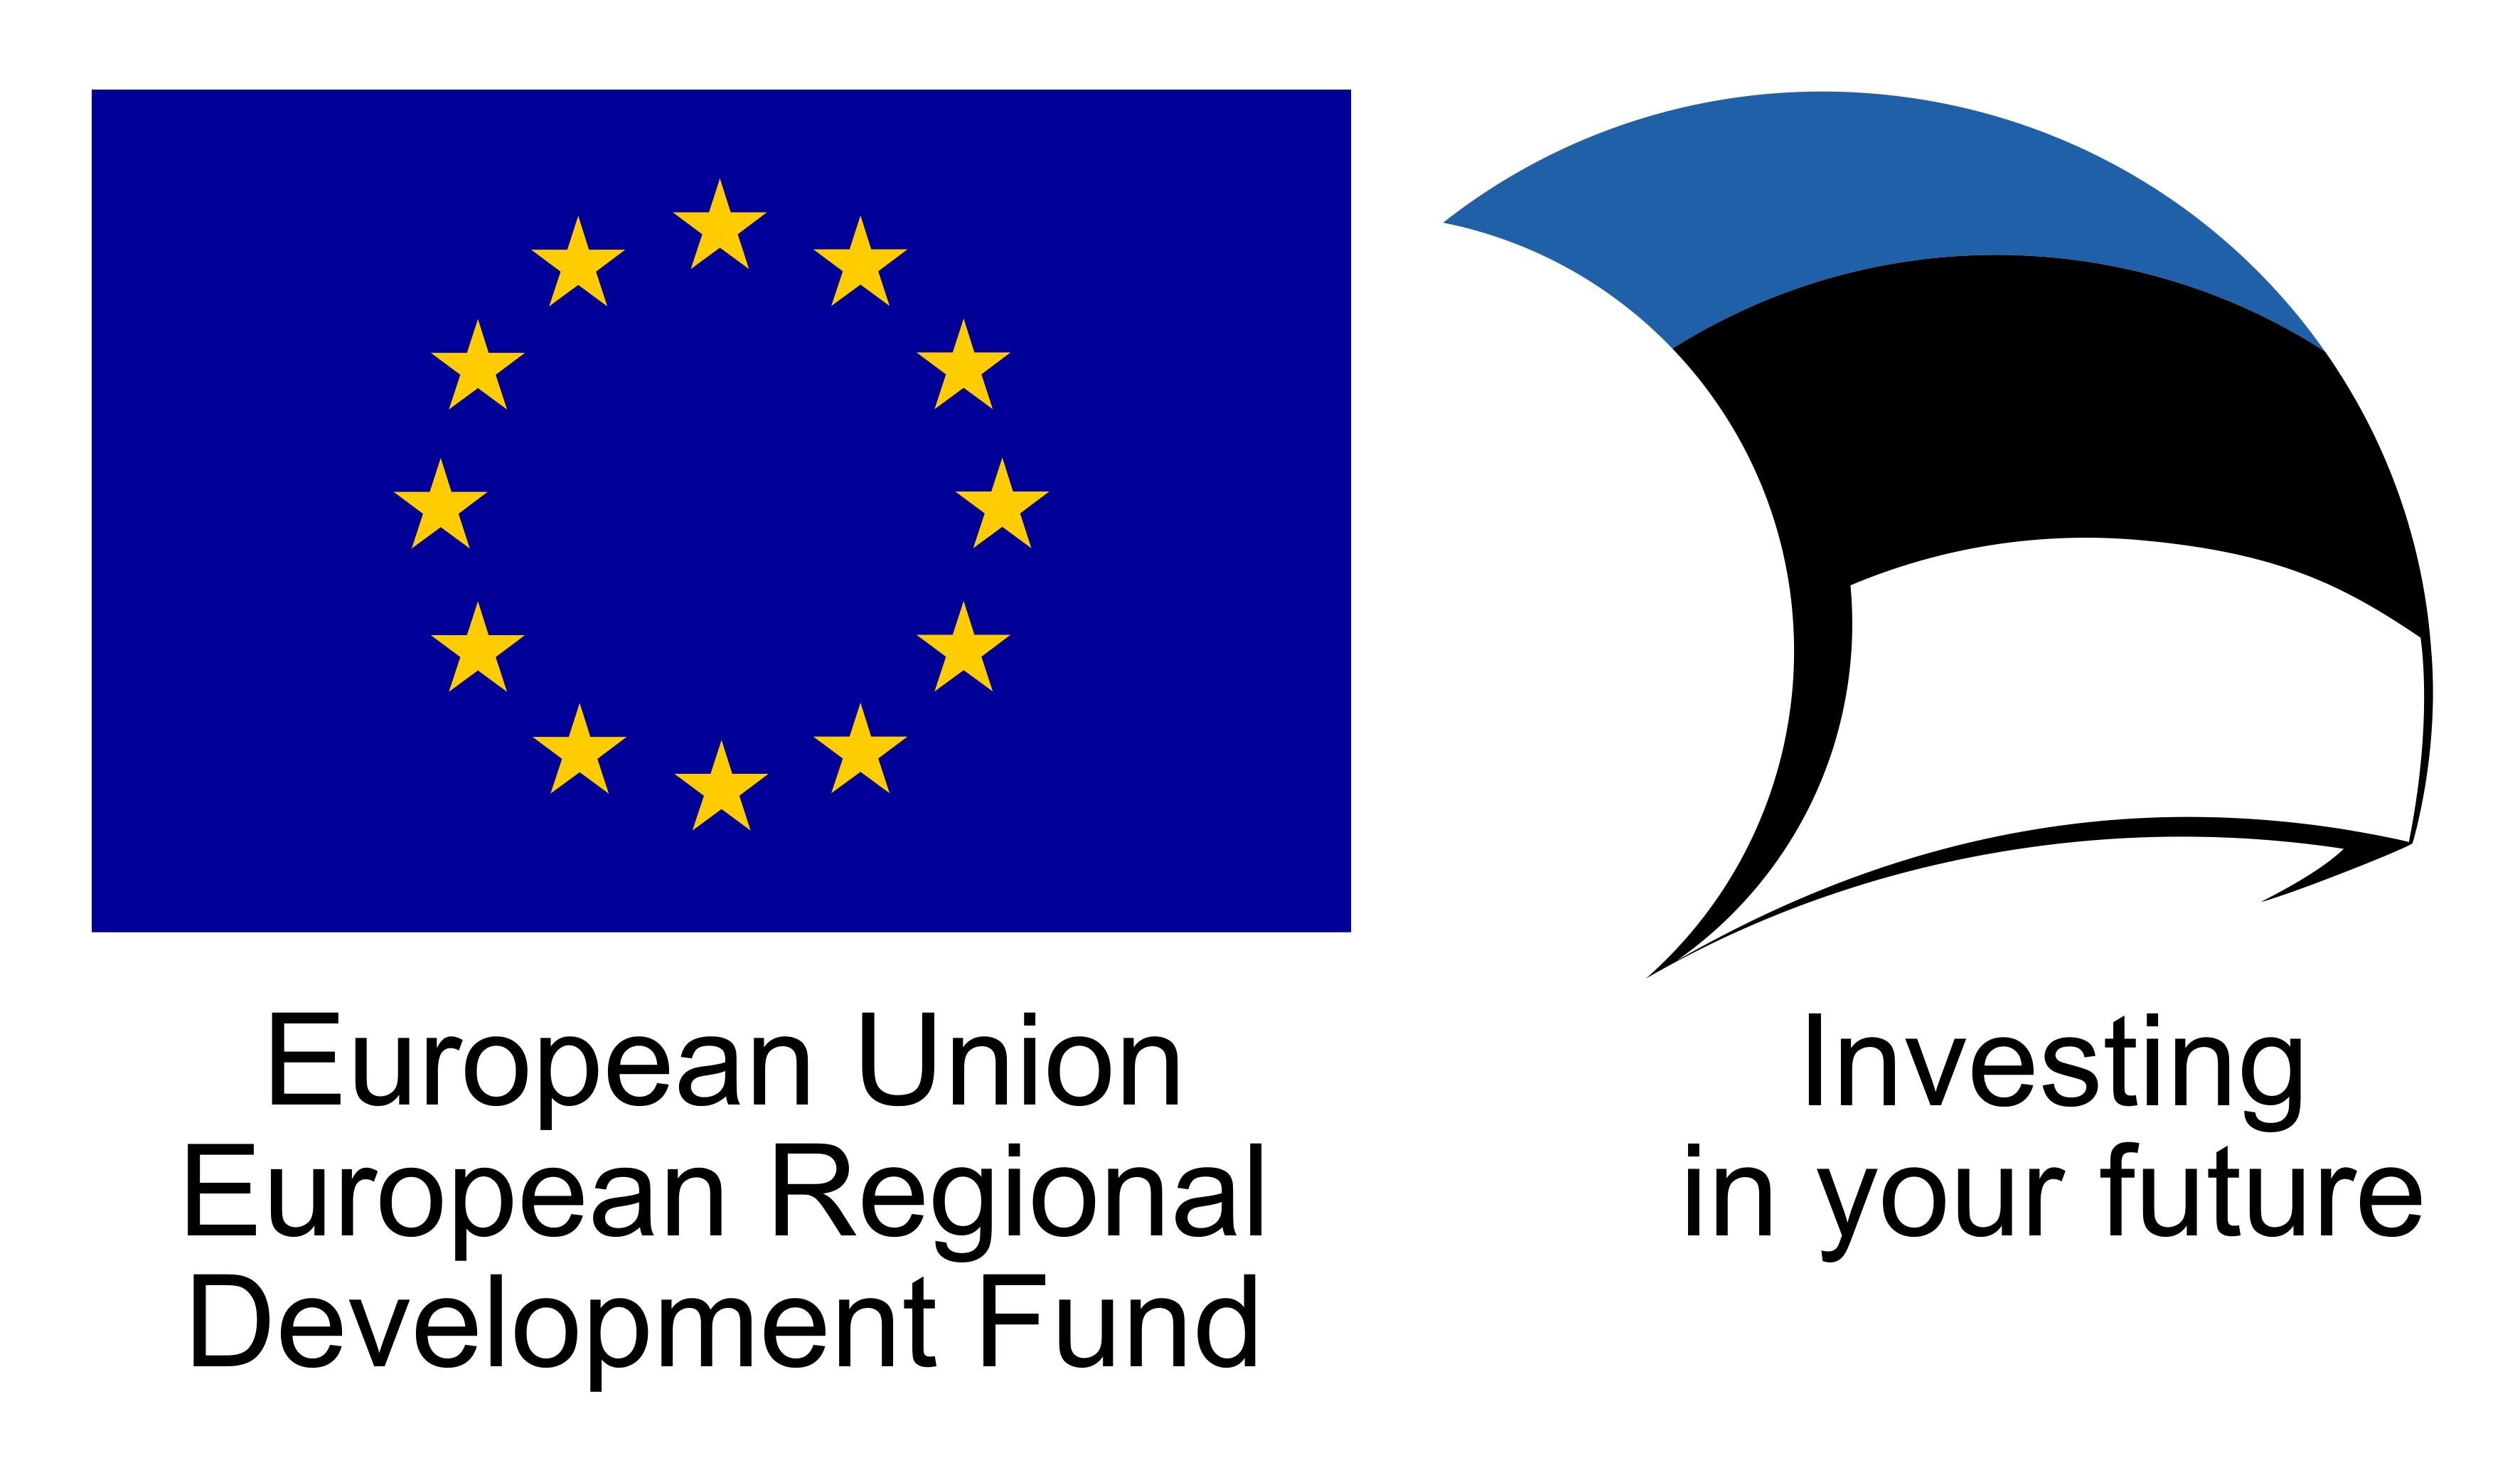 EL Regional Development Fund